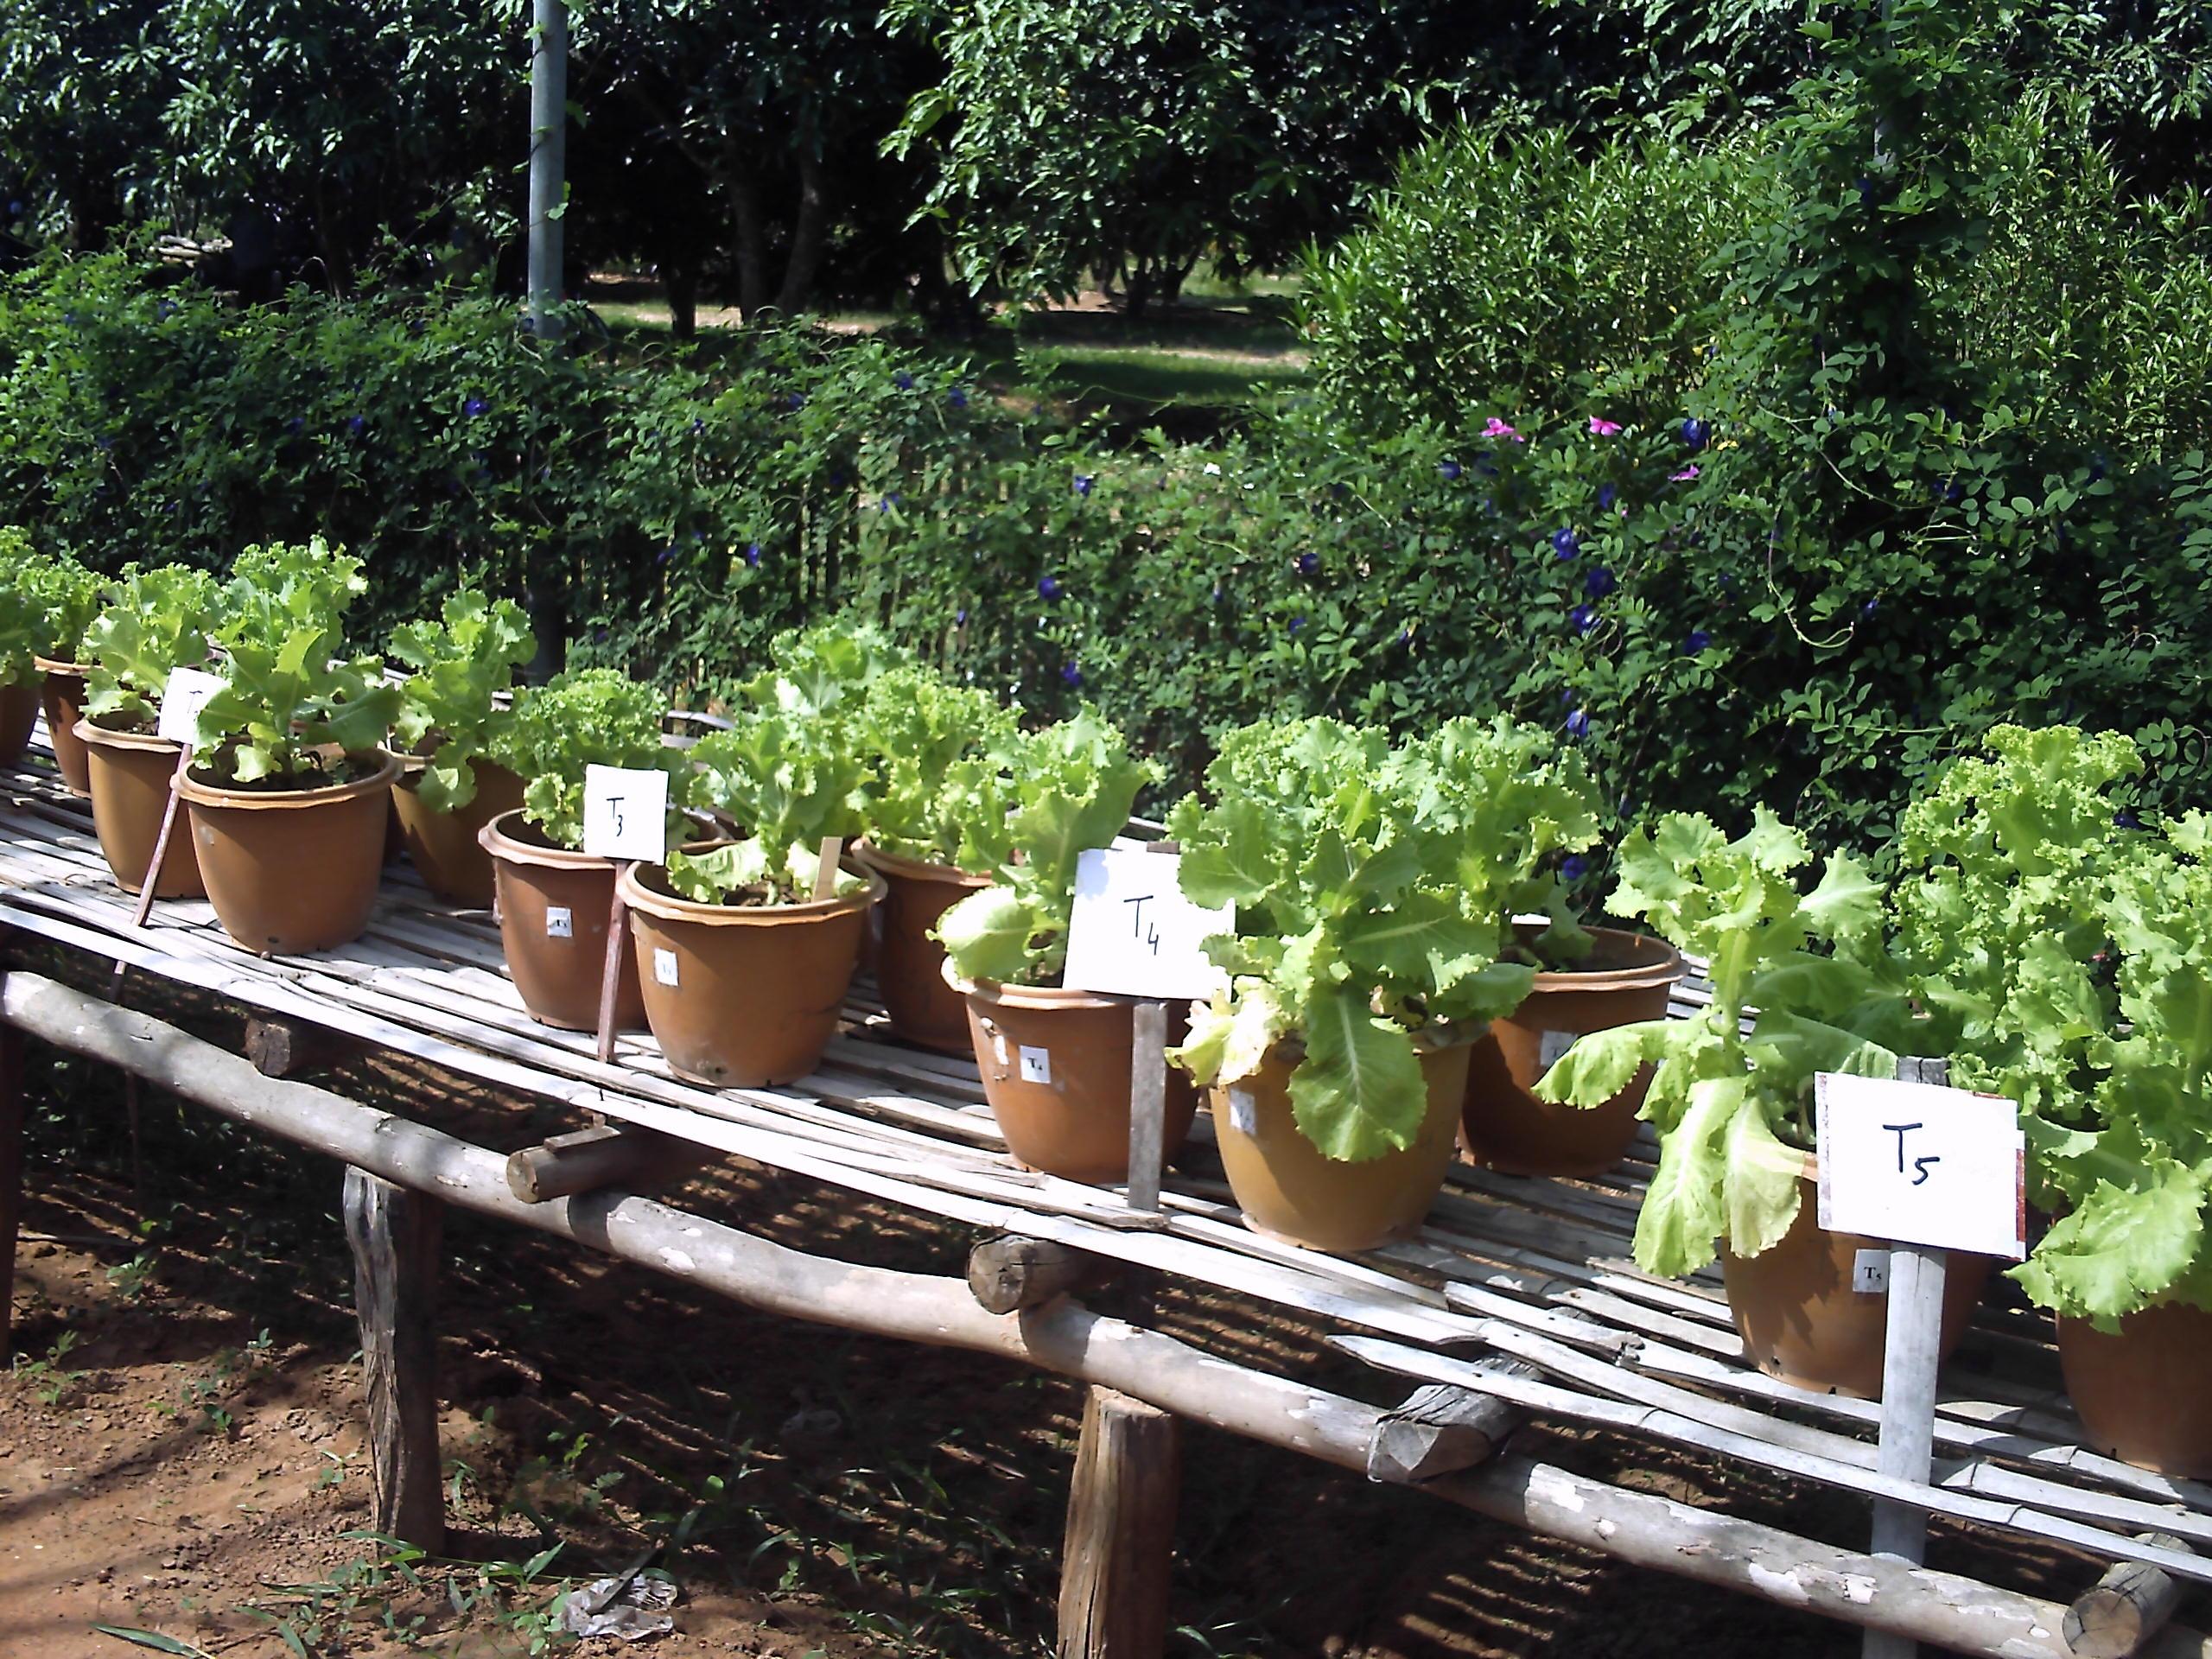 Growing lettuce in a pot - Lettuce Pot Trials Tuk Vil On Day Of Harvest 17 06 2010